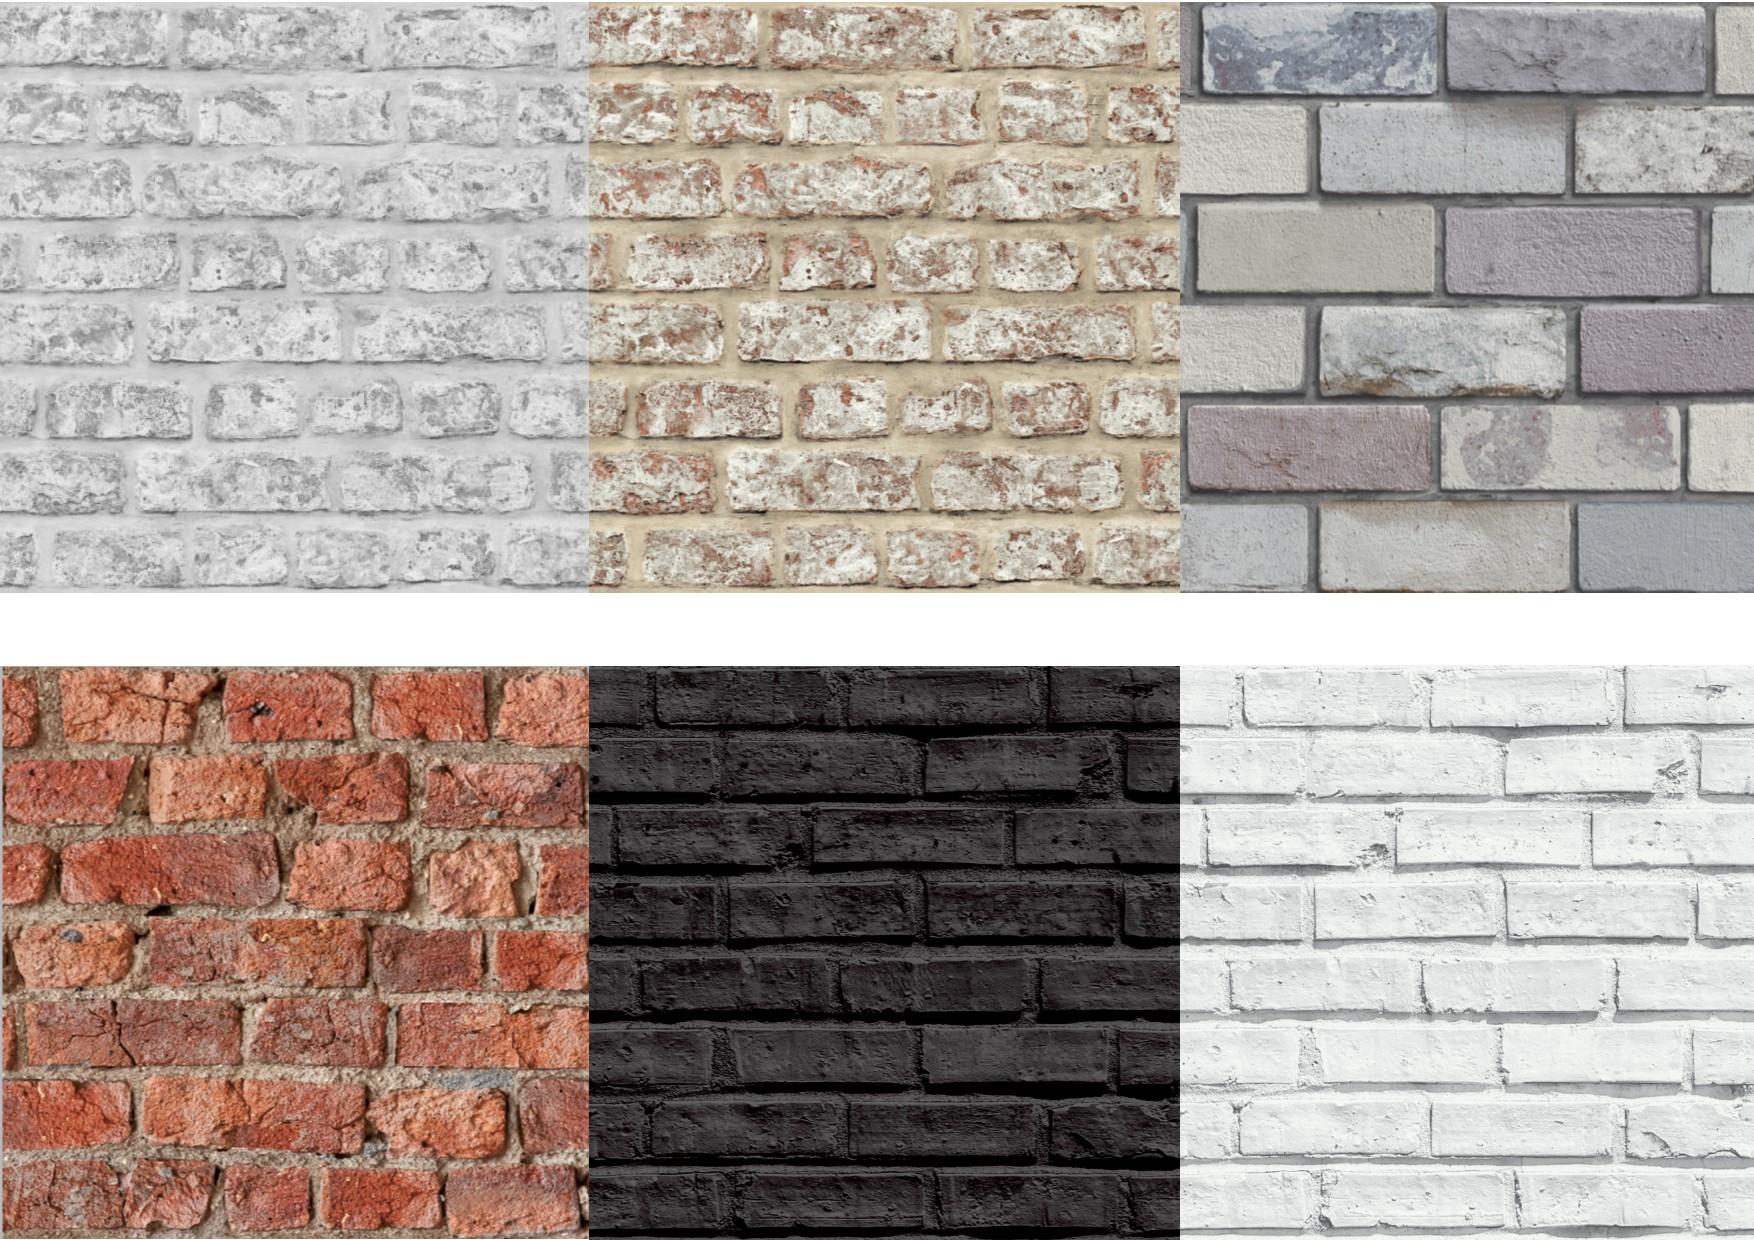 Arthouse 3d effect brick wallpaper 629004 623007 696600 for 3d brick wallpaper uk